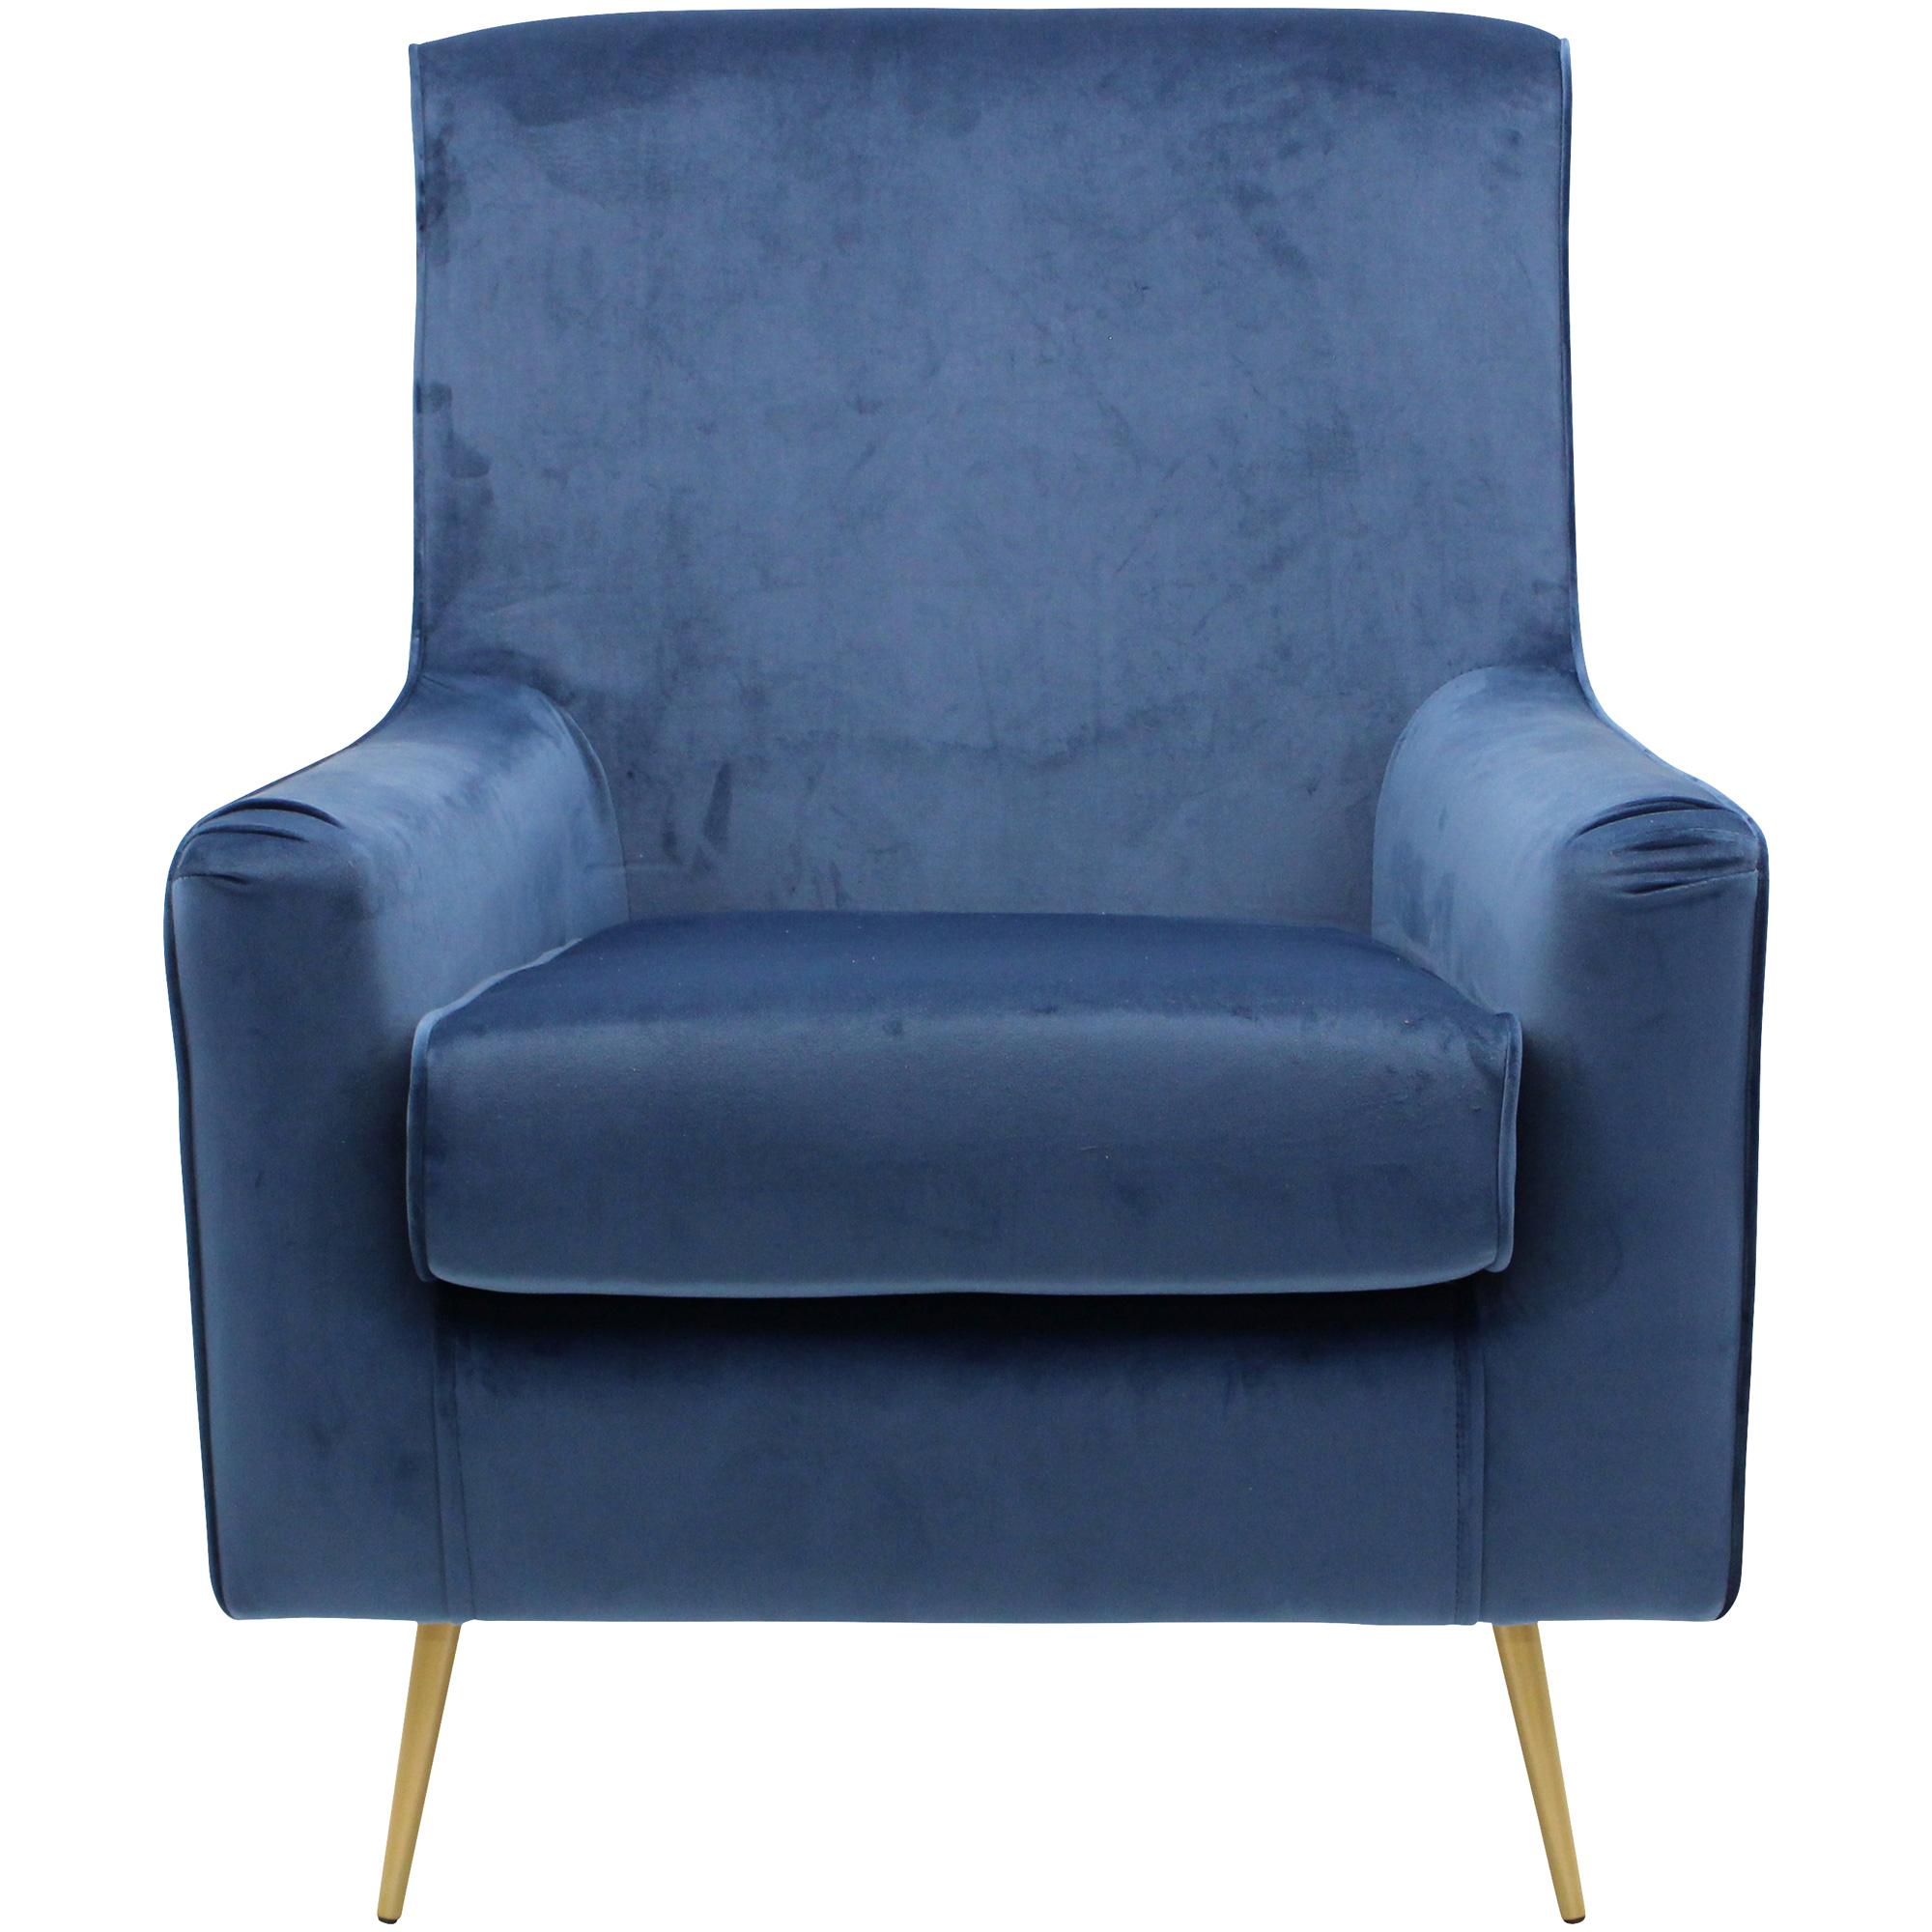 Overman | Lana Parisian Accent Chair